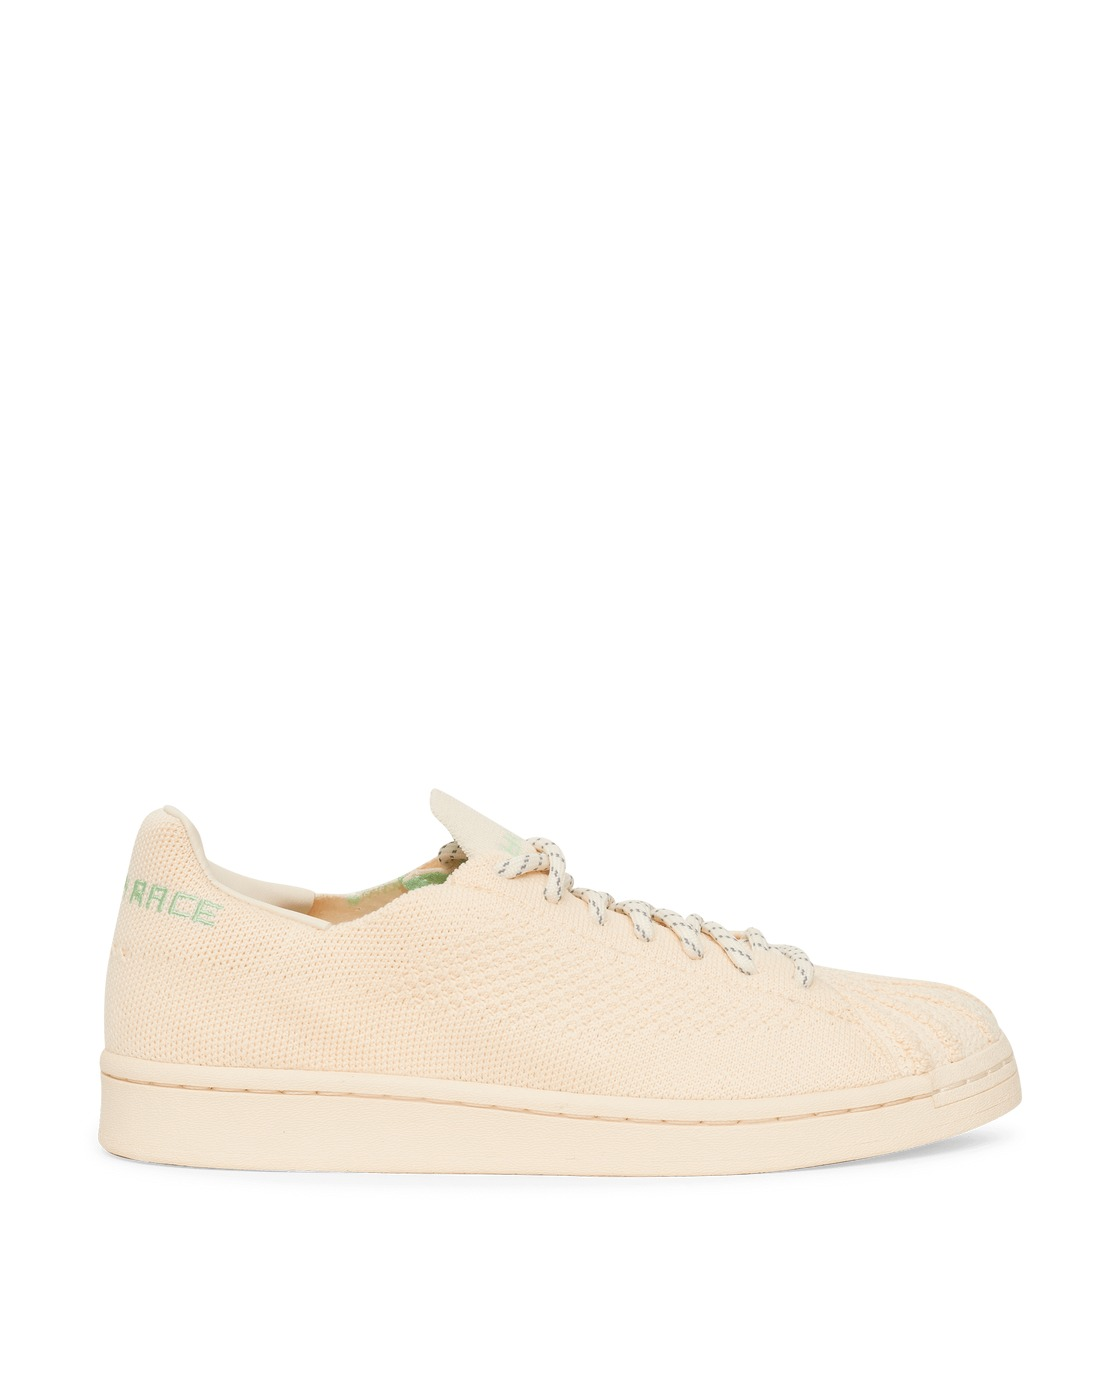 Adidas Originals Pharrell Williams Pk Sneakers Core White